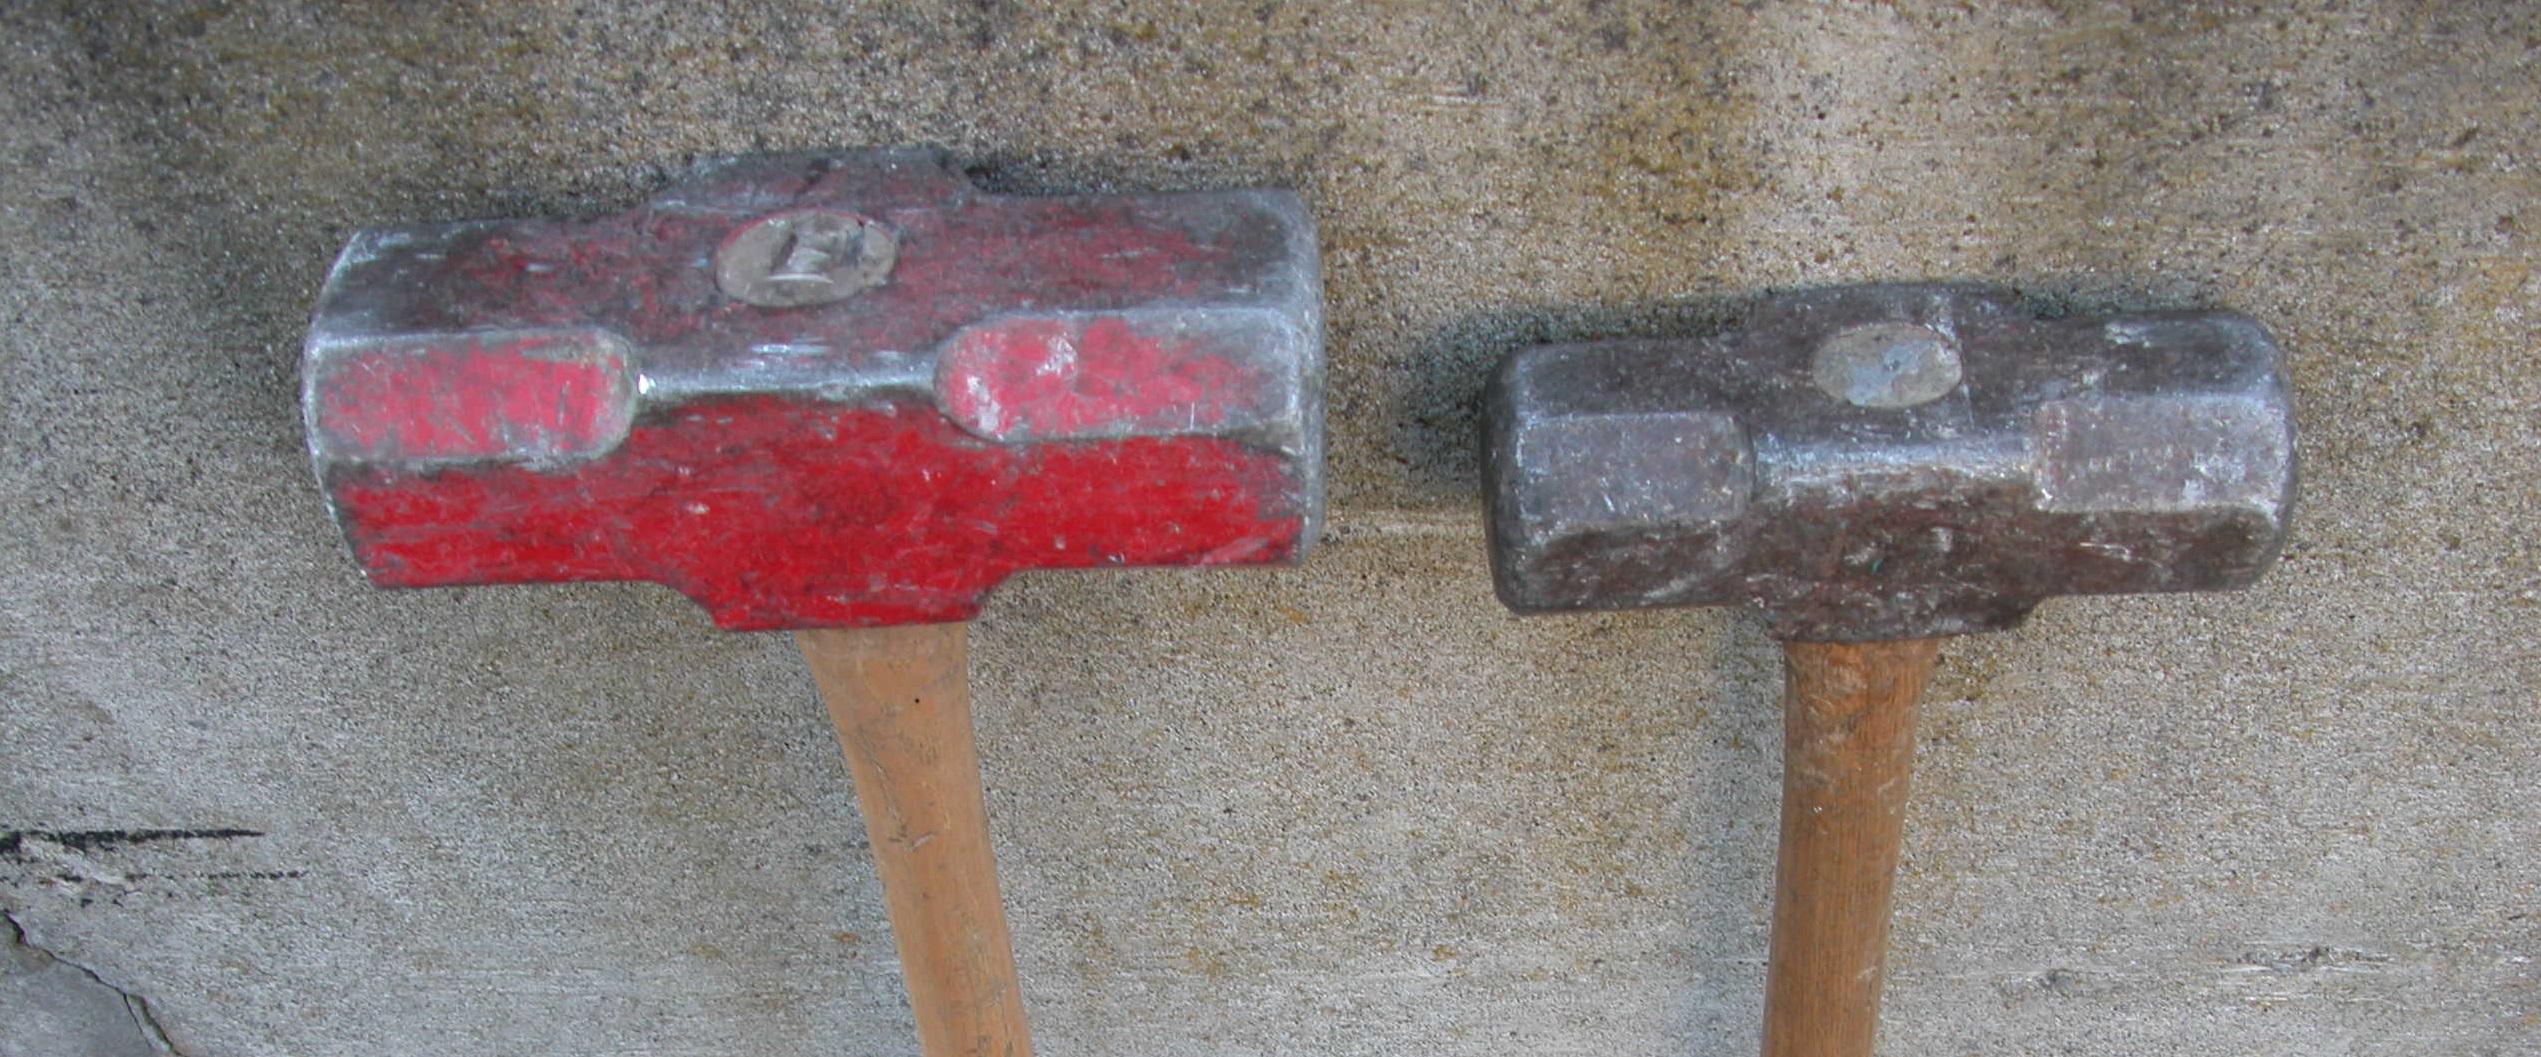 Sledgehammers-11